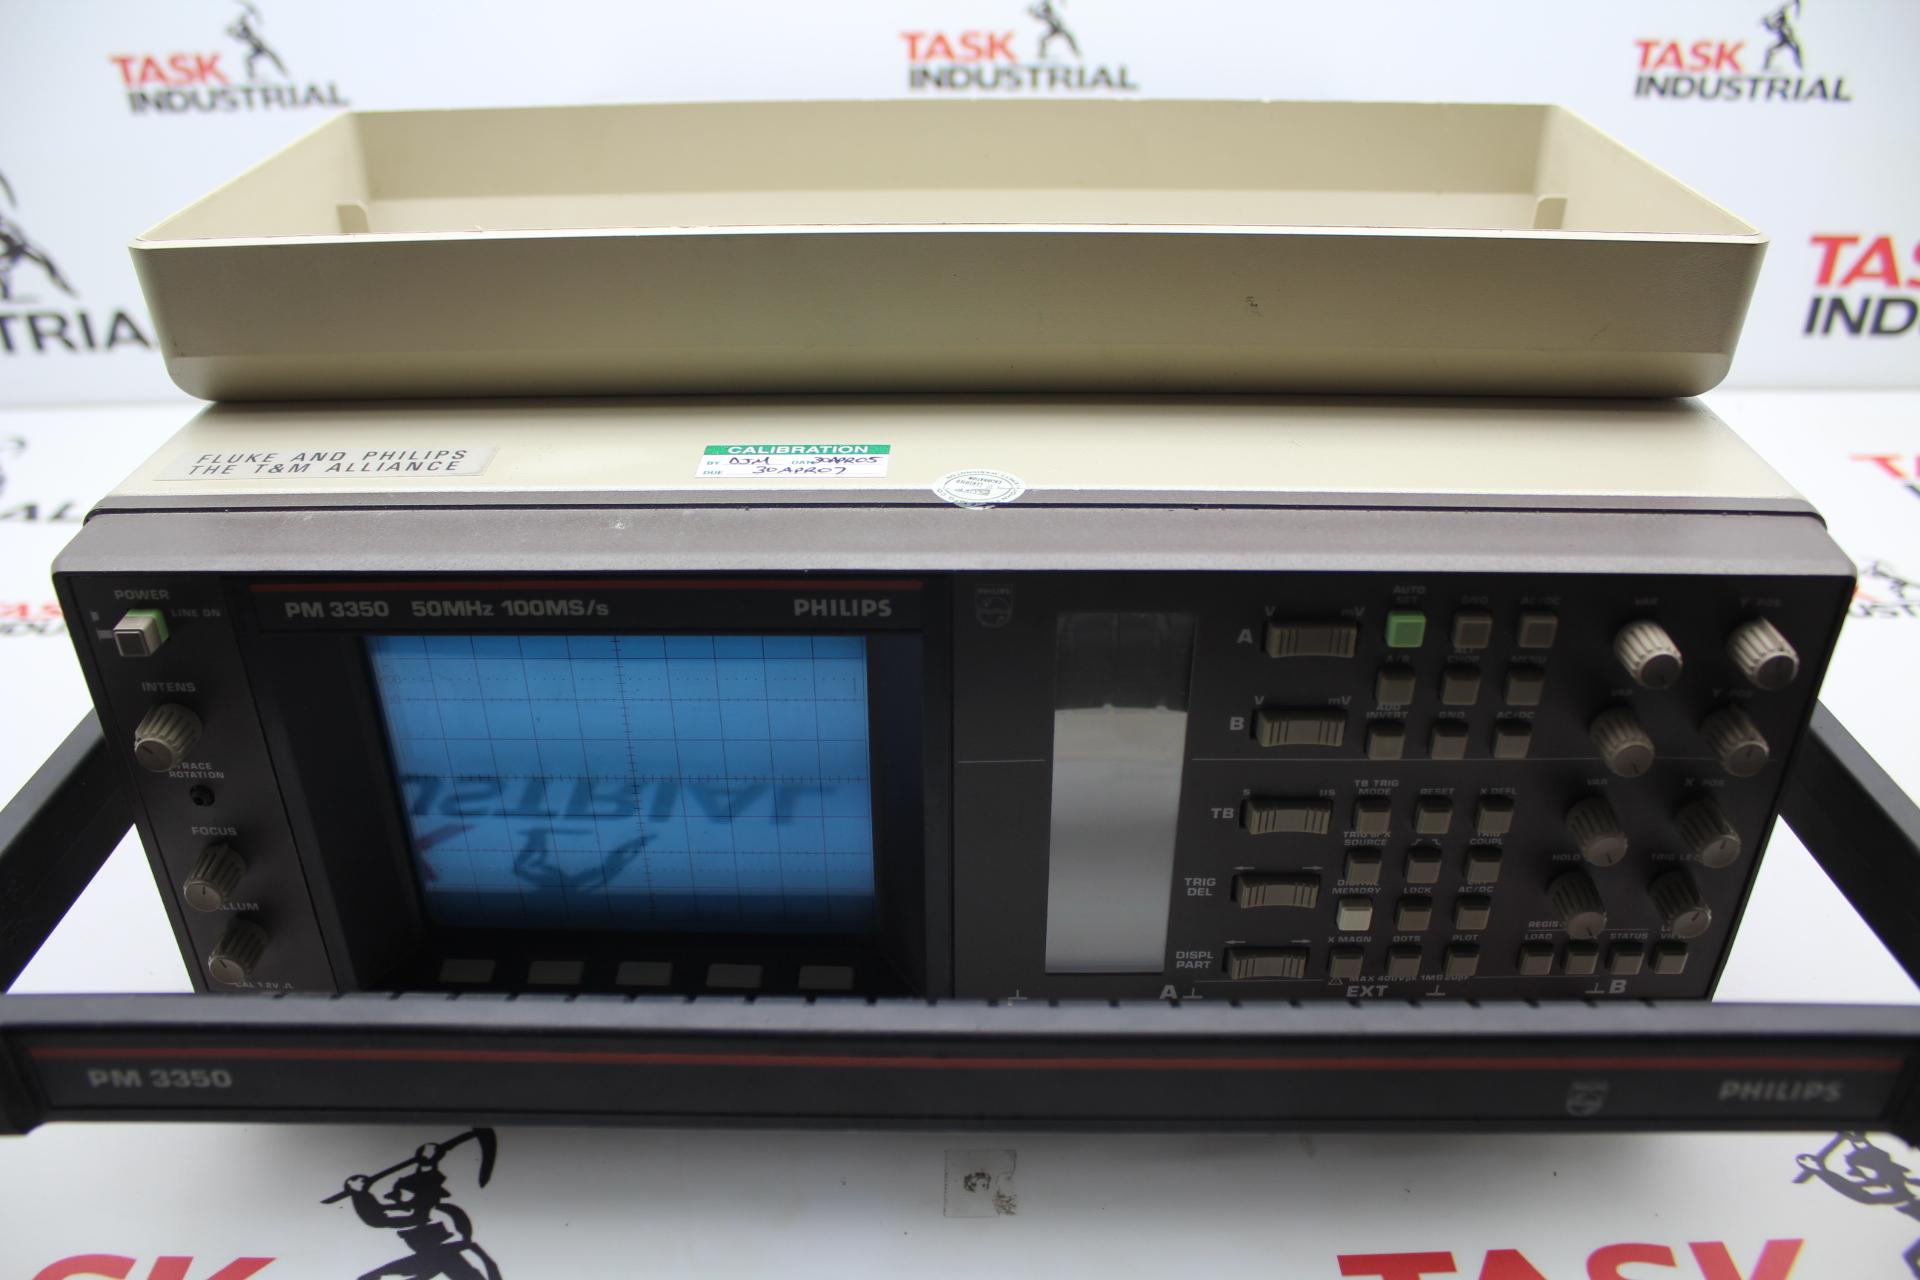 Philips Type PM 3350/40 Oscilloscope